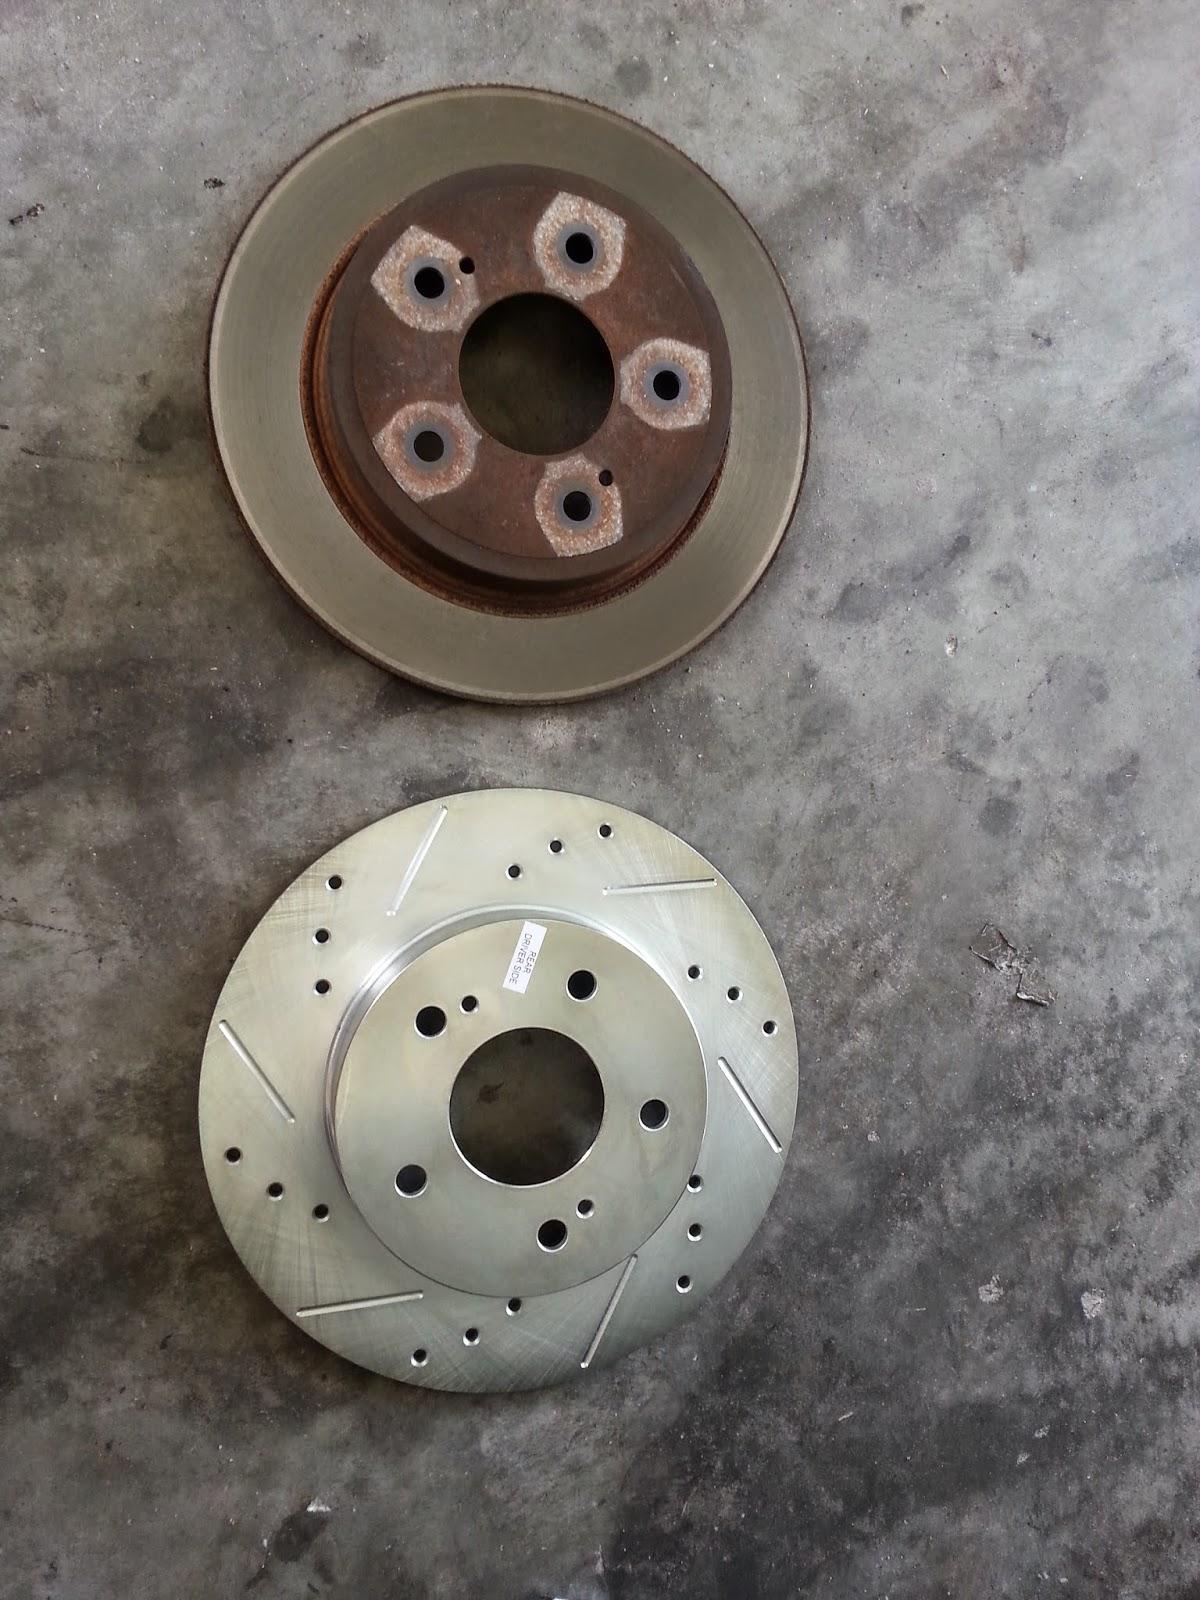 moreover Img also Acura Rl Premium White Pearl In Adams North Carolina in addition Mztjrqslw Lj Kr Nhuzg Q together with . on infiniti i30 emergency brake